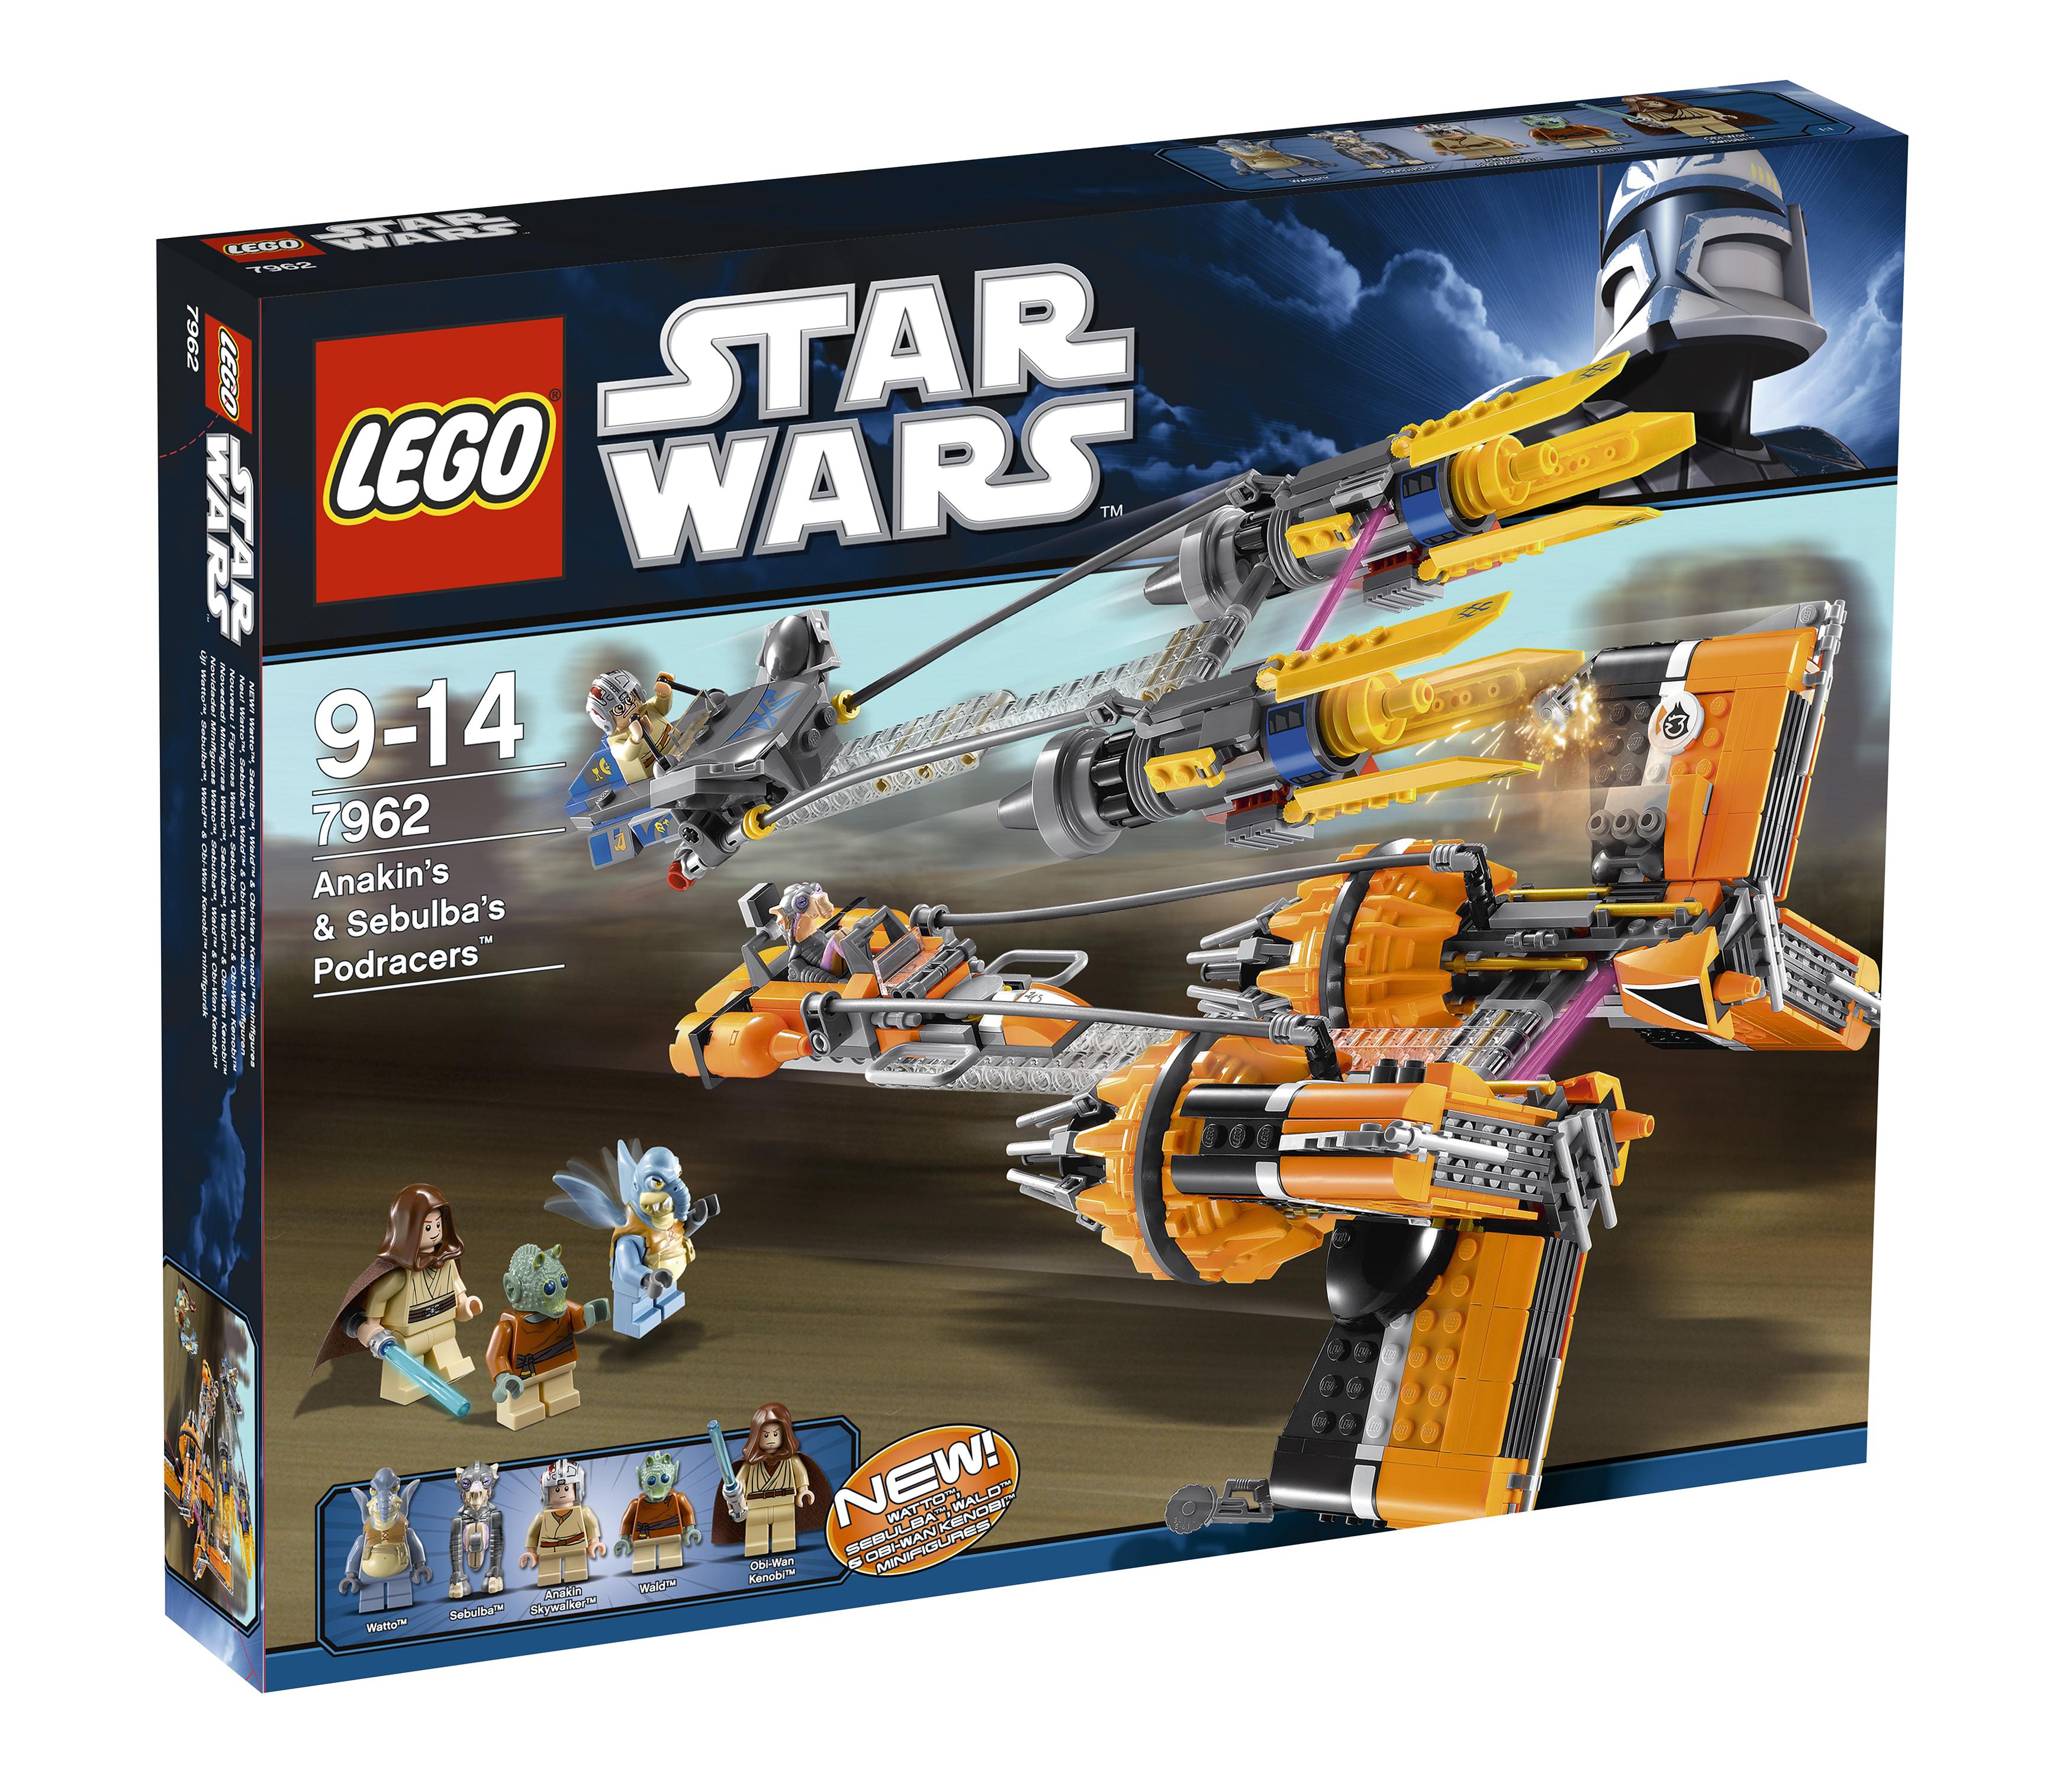 LEGO Bau- & Konstruktionsspielzeug ### LEGO® Star Wars™ Mini Figur Wald aus Set 7962 NEU ###